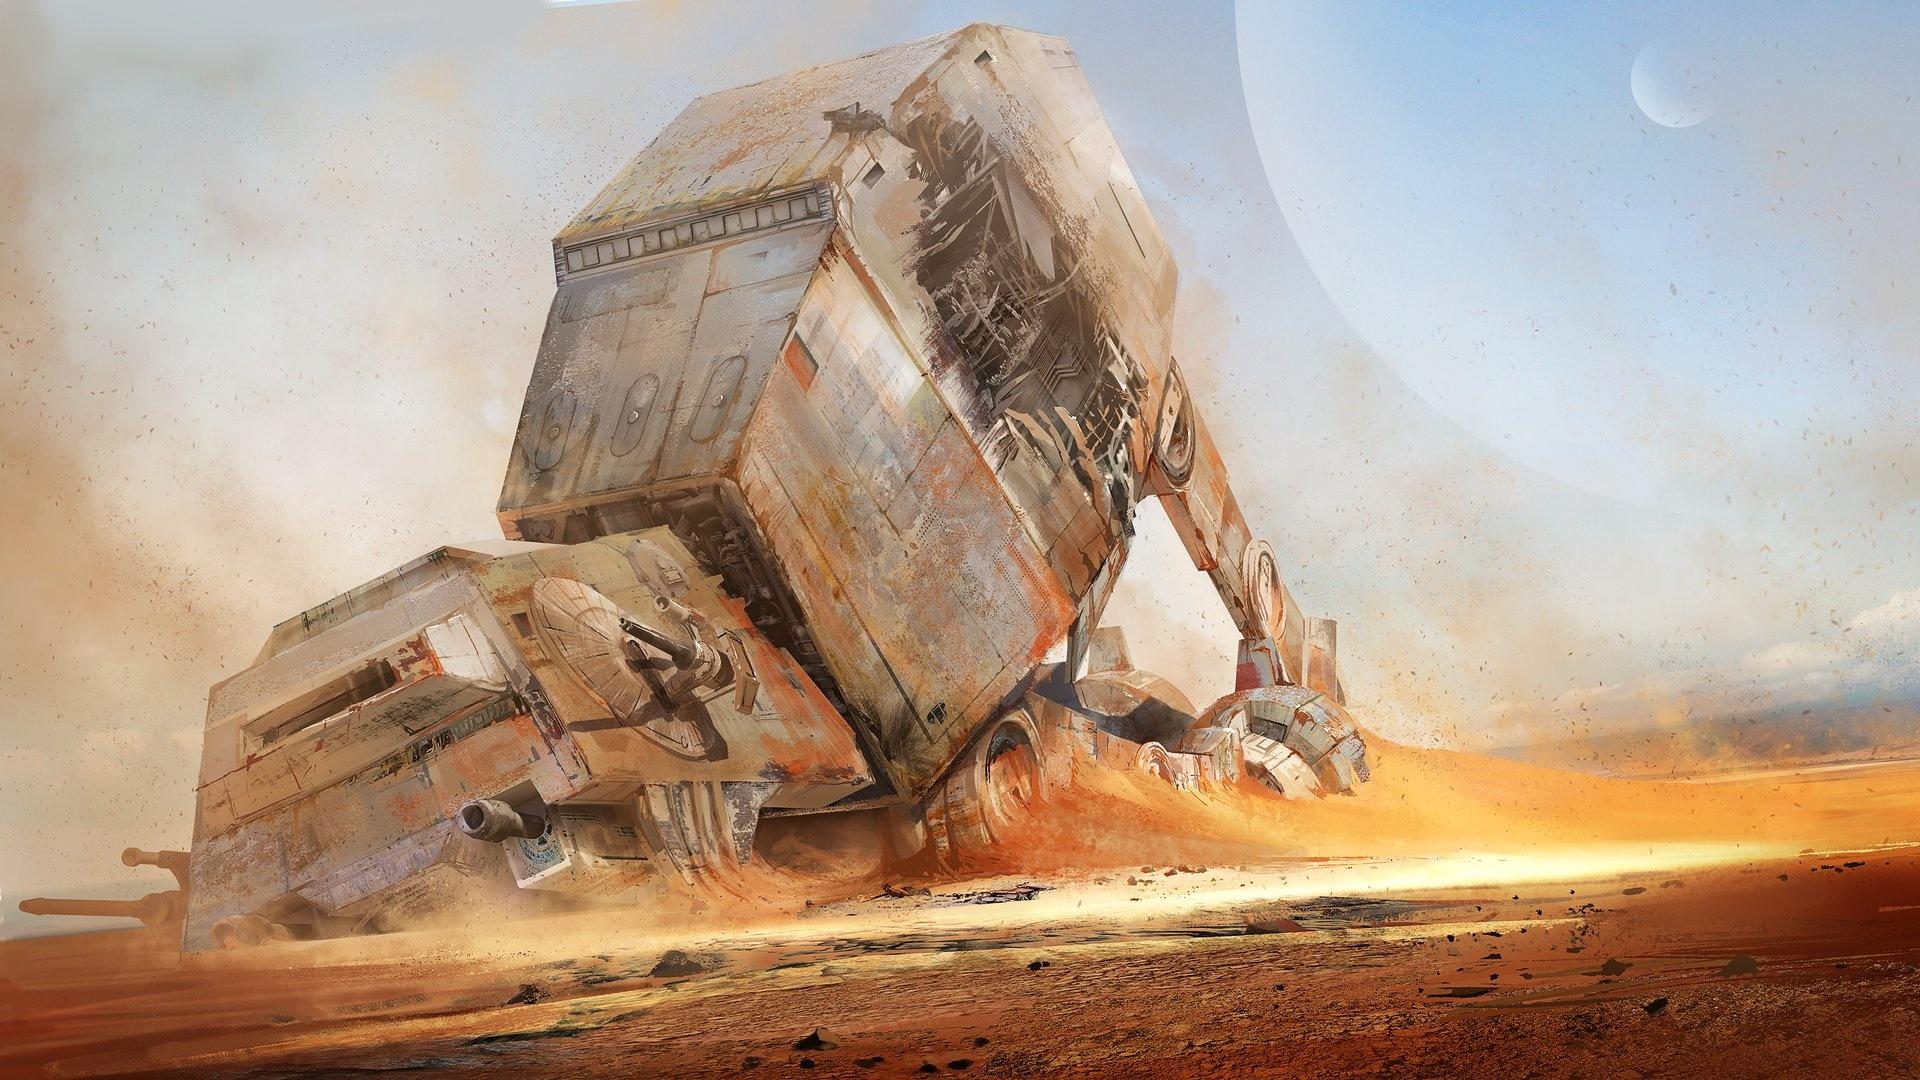 Star Wars best wallpaper